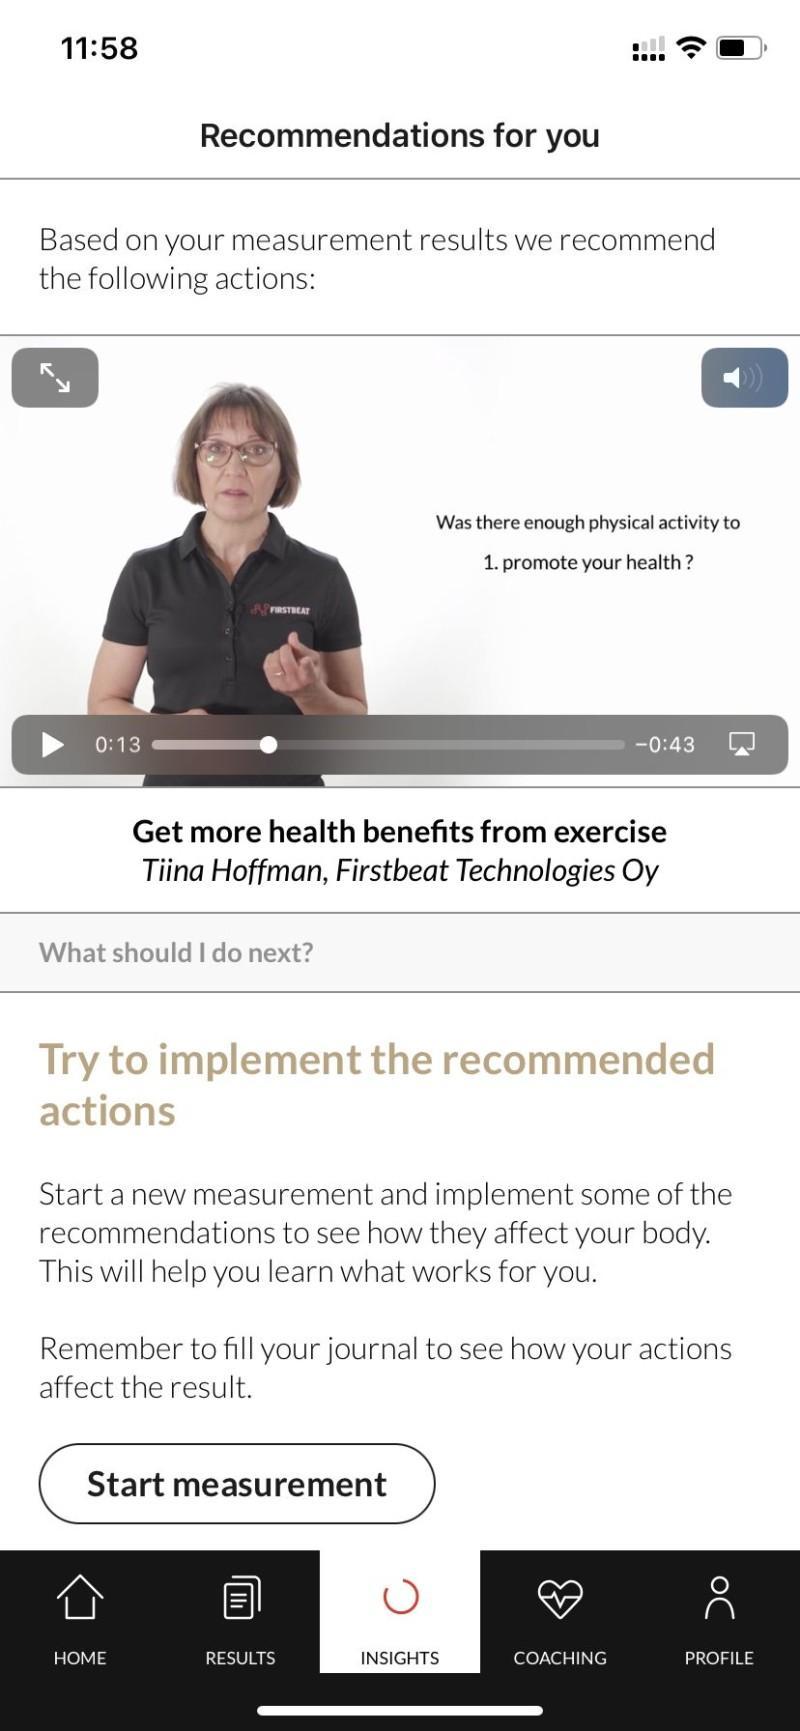 Video recomendations